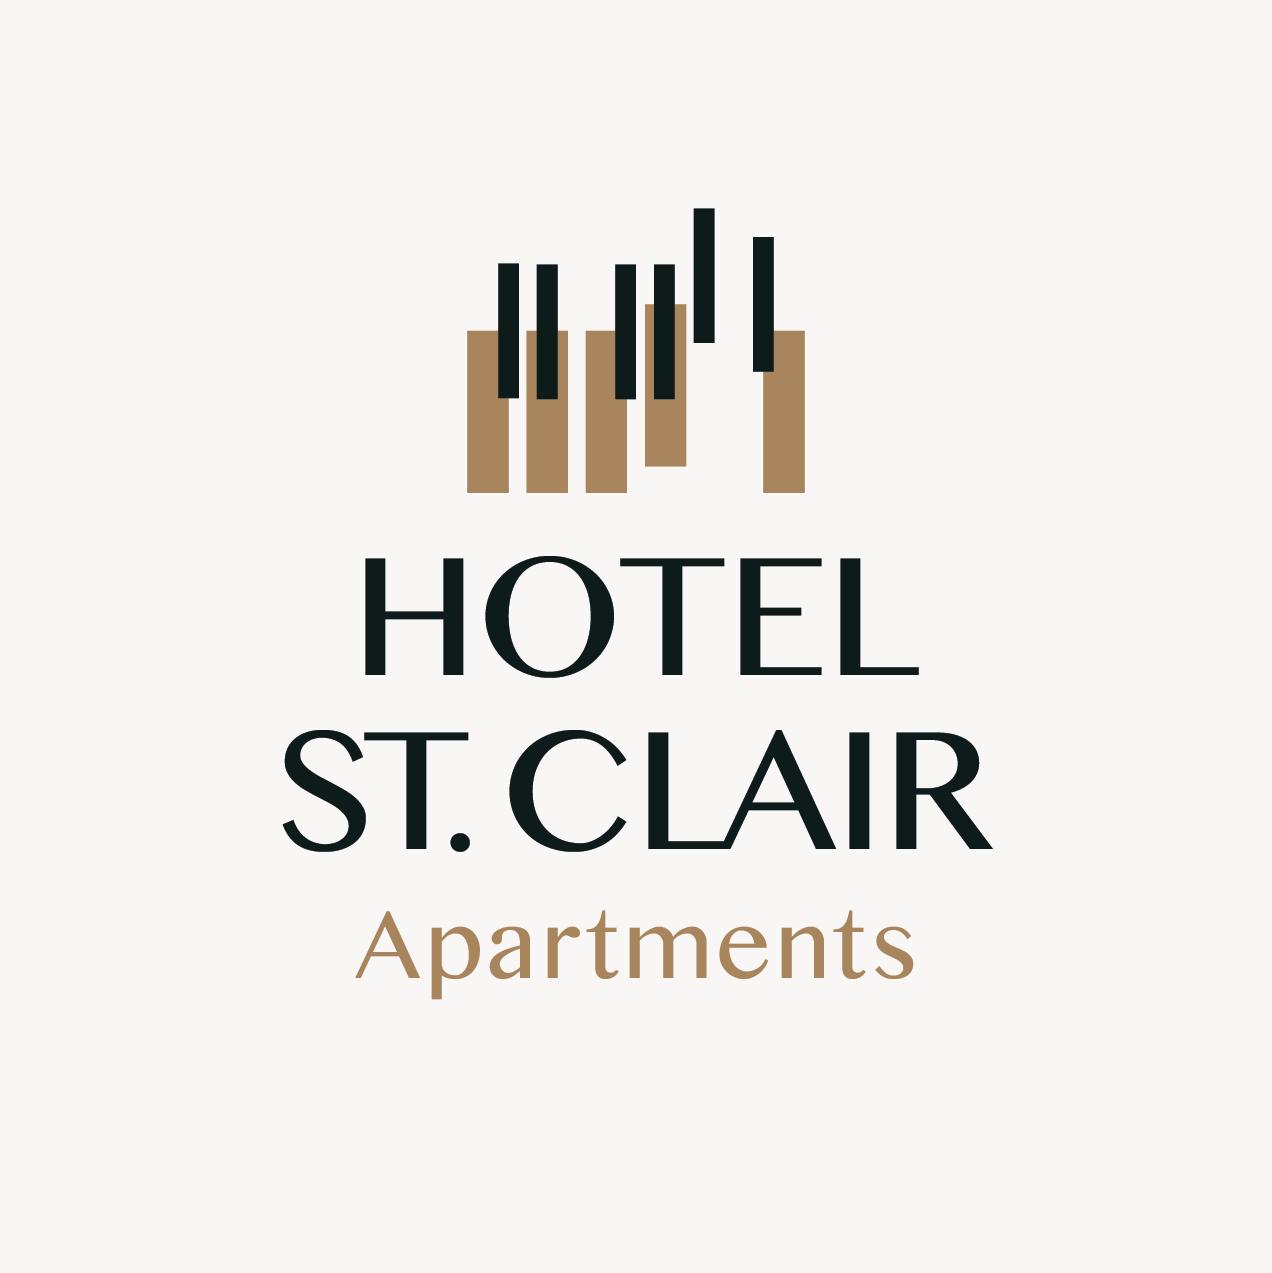 cheers-studios-digital-branding-columbus-ohio-hotel-st-clair-apartments-logo-option2-piano.png